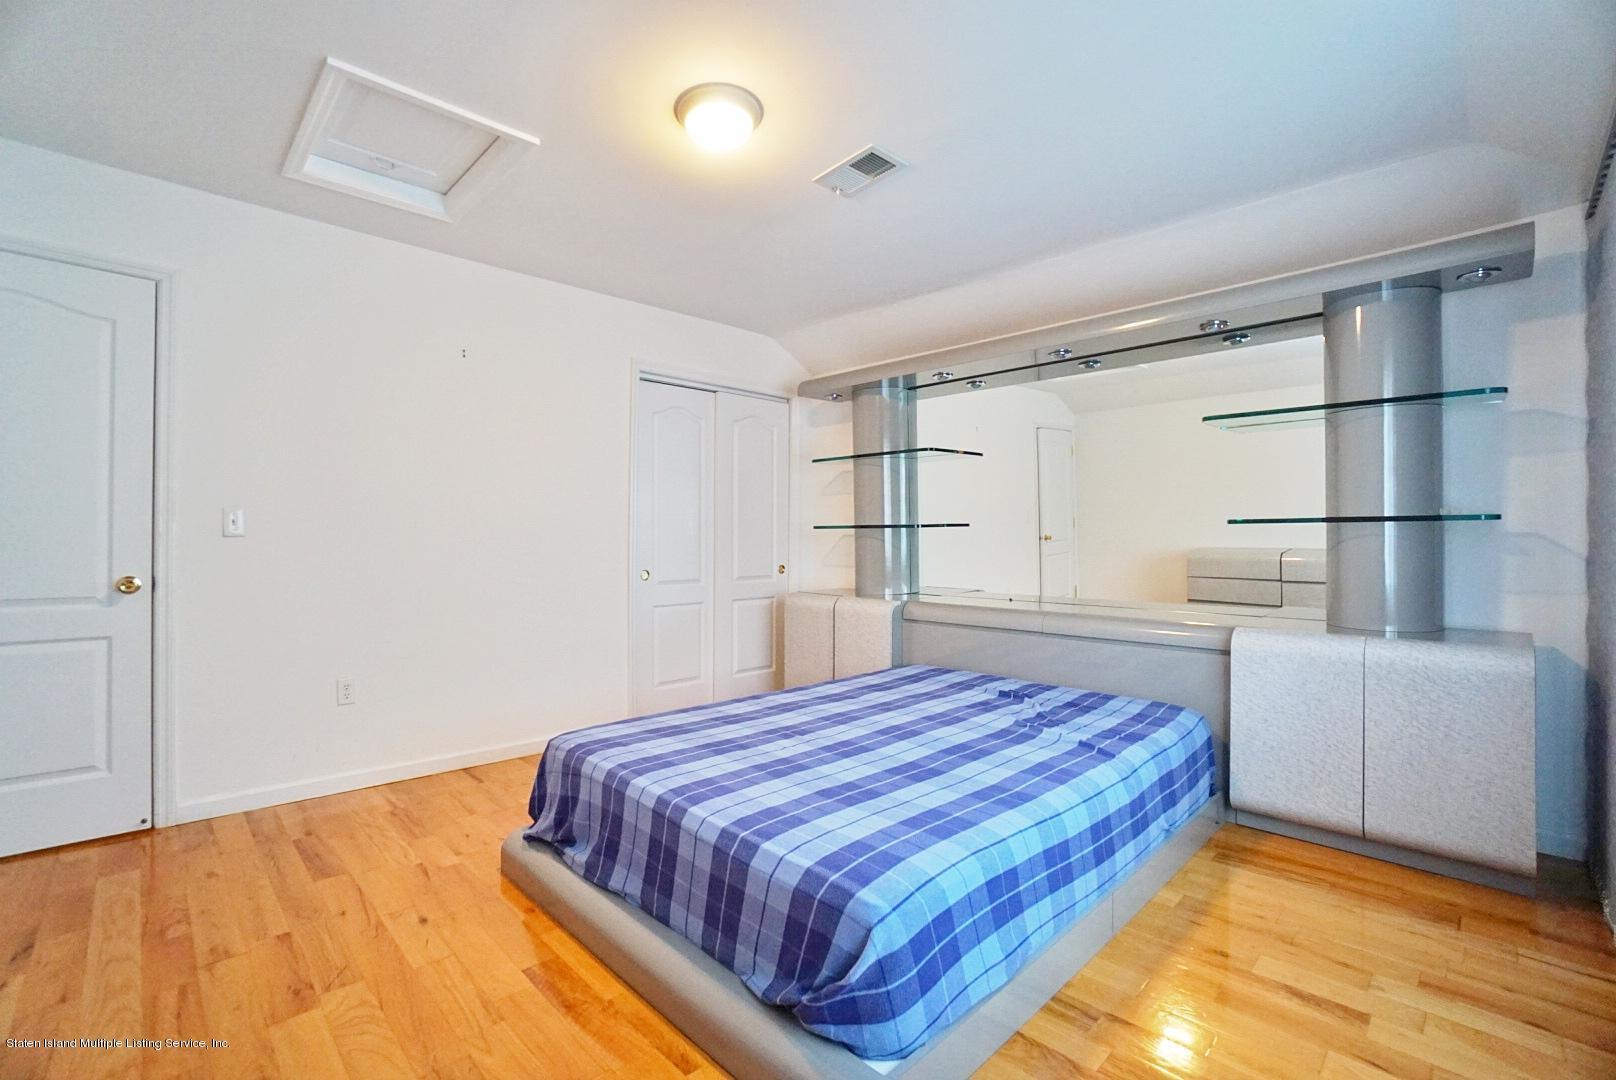 Single Family - Detached 311 Norway Avenue  Staten Island, NY 10305, MLS-1132870-20